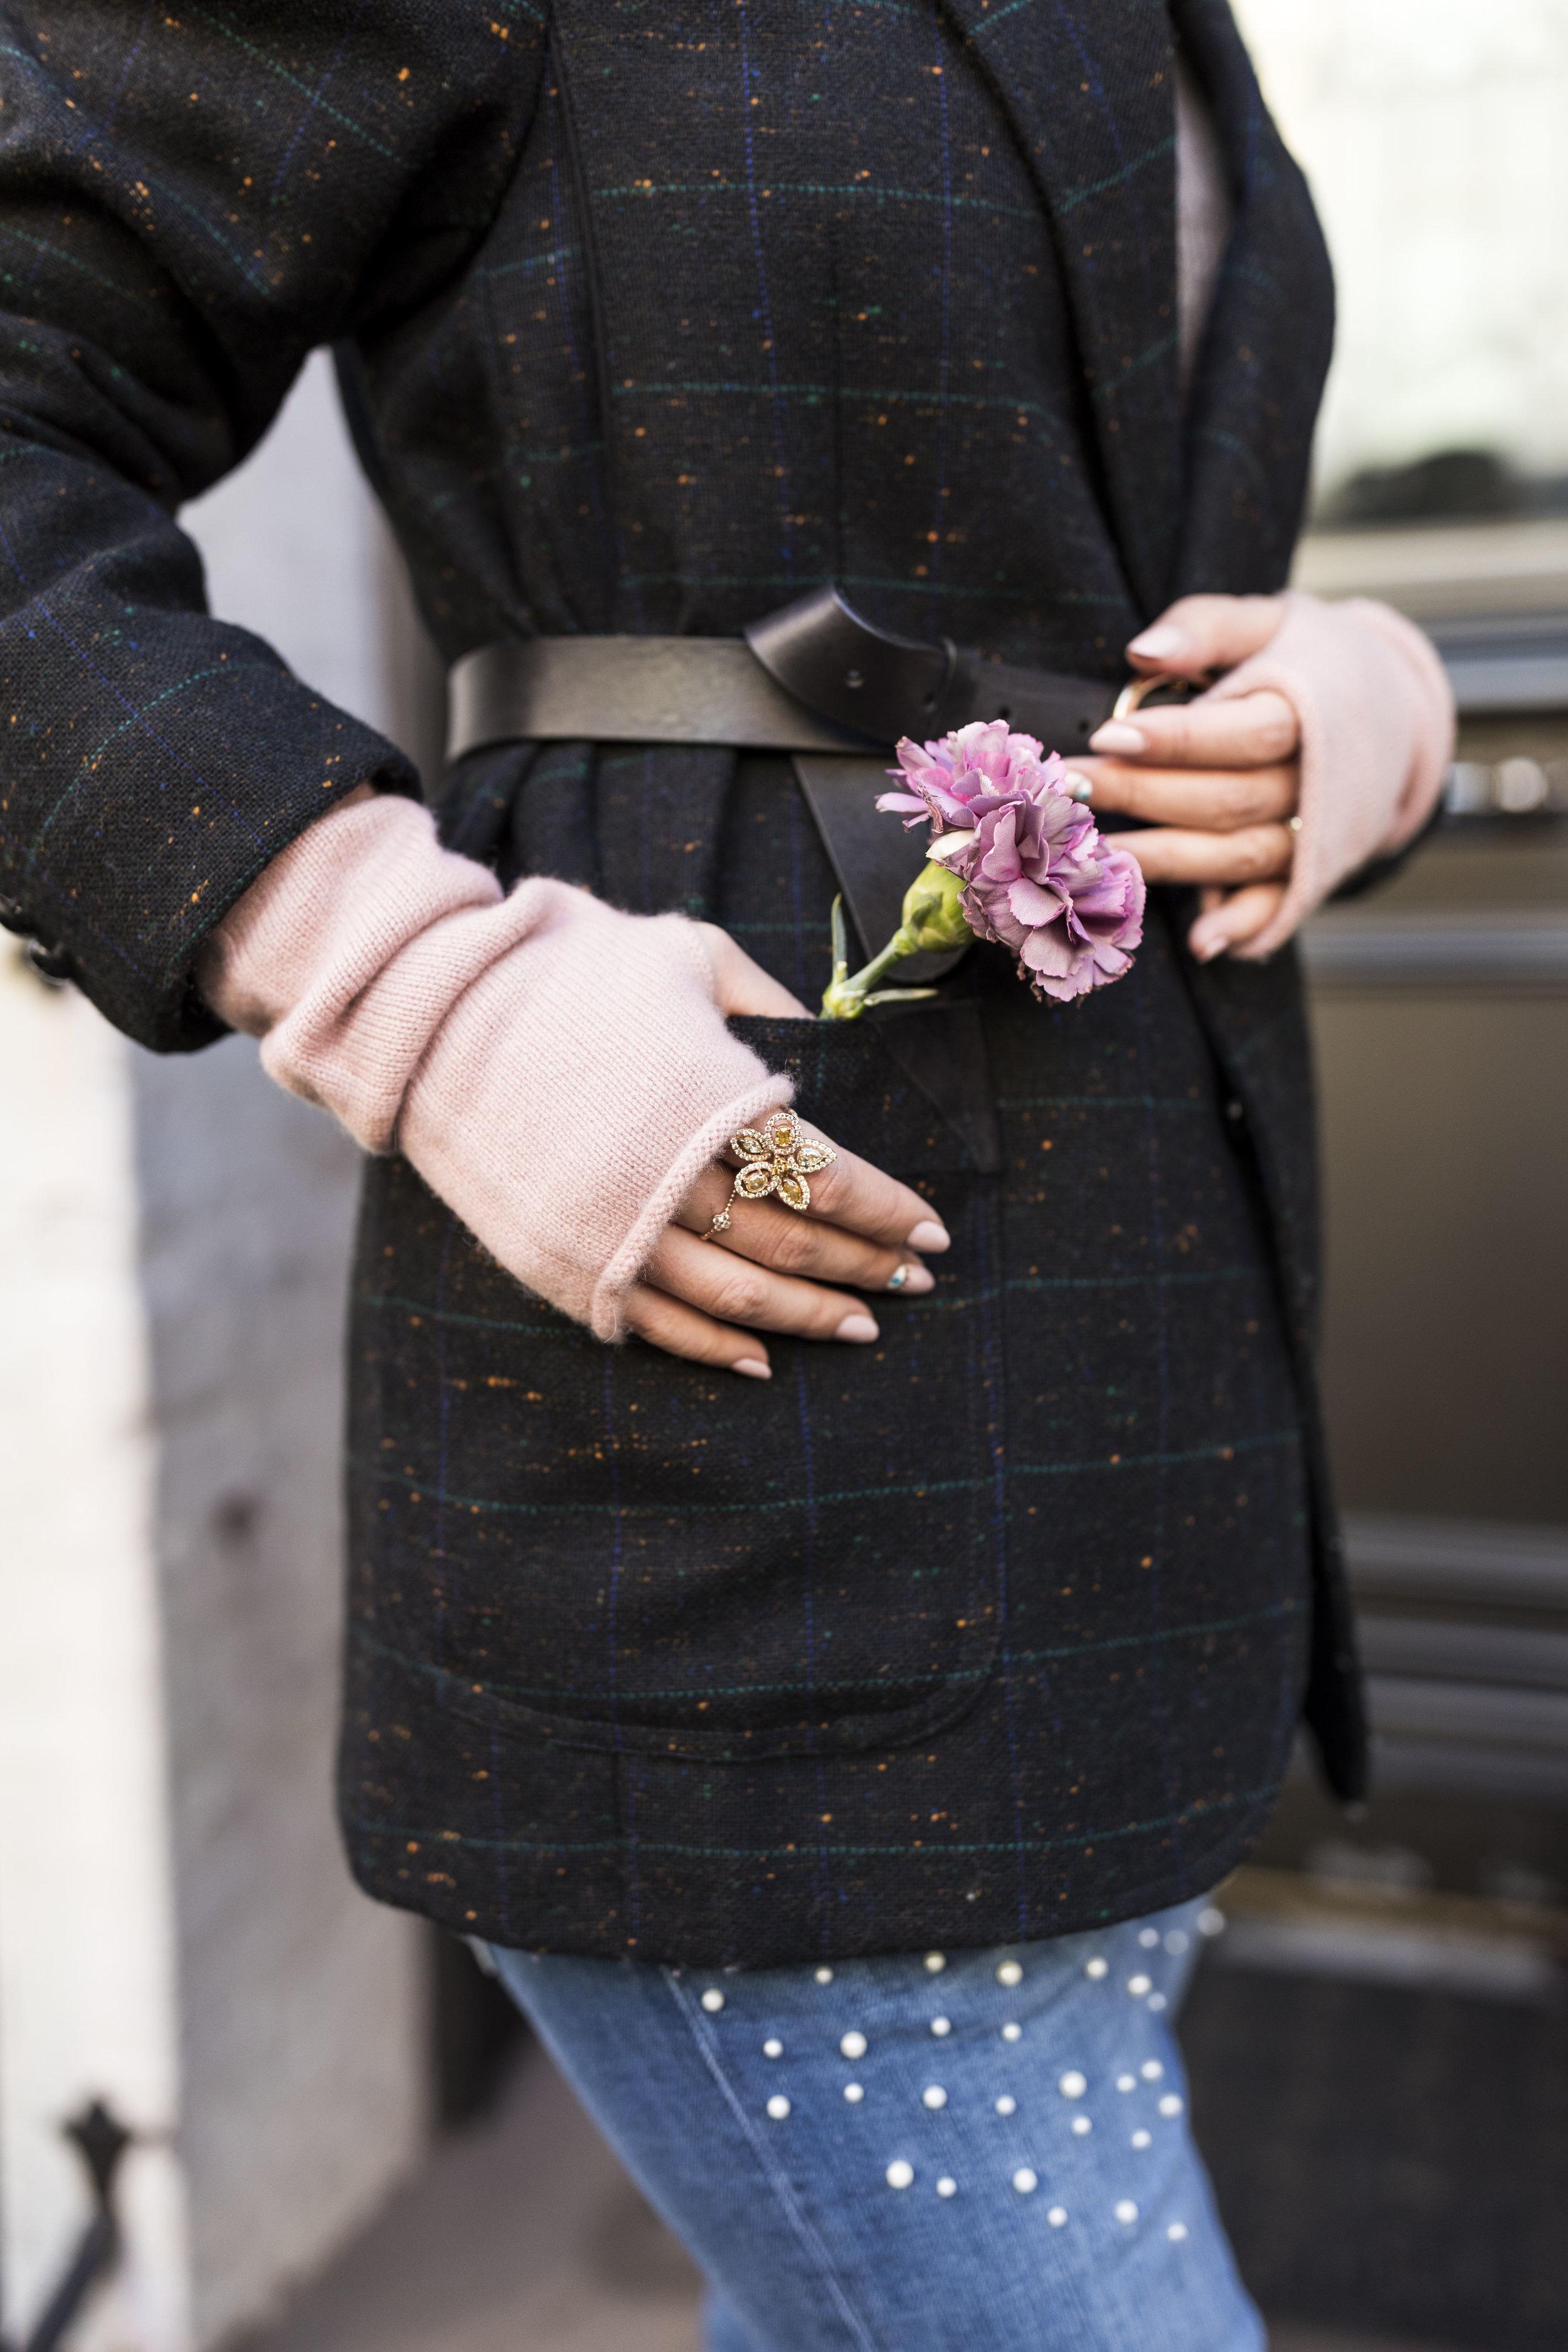 My  fingerless gloves  are from Naadam. Photo taken by  Ashley Gallerani .